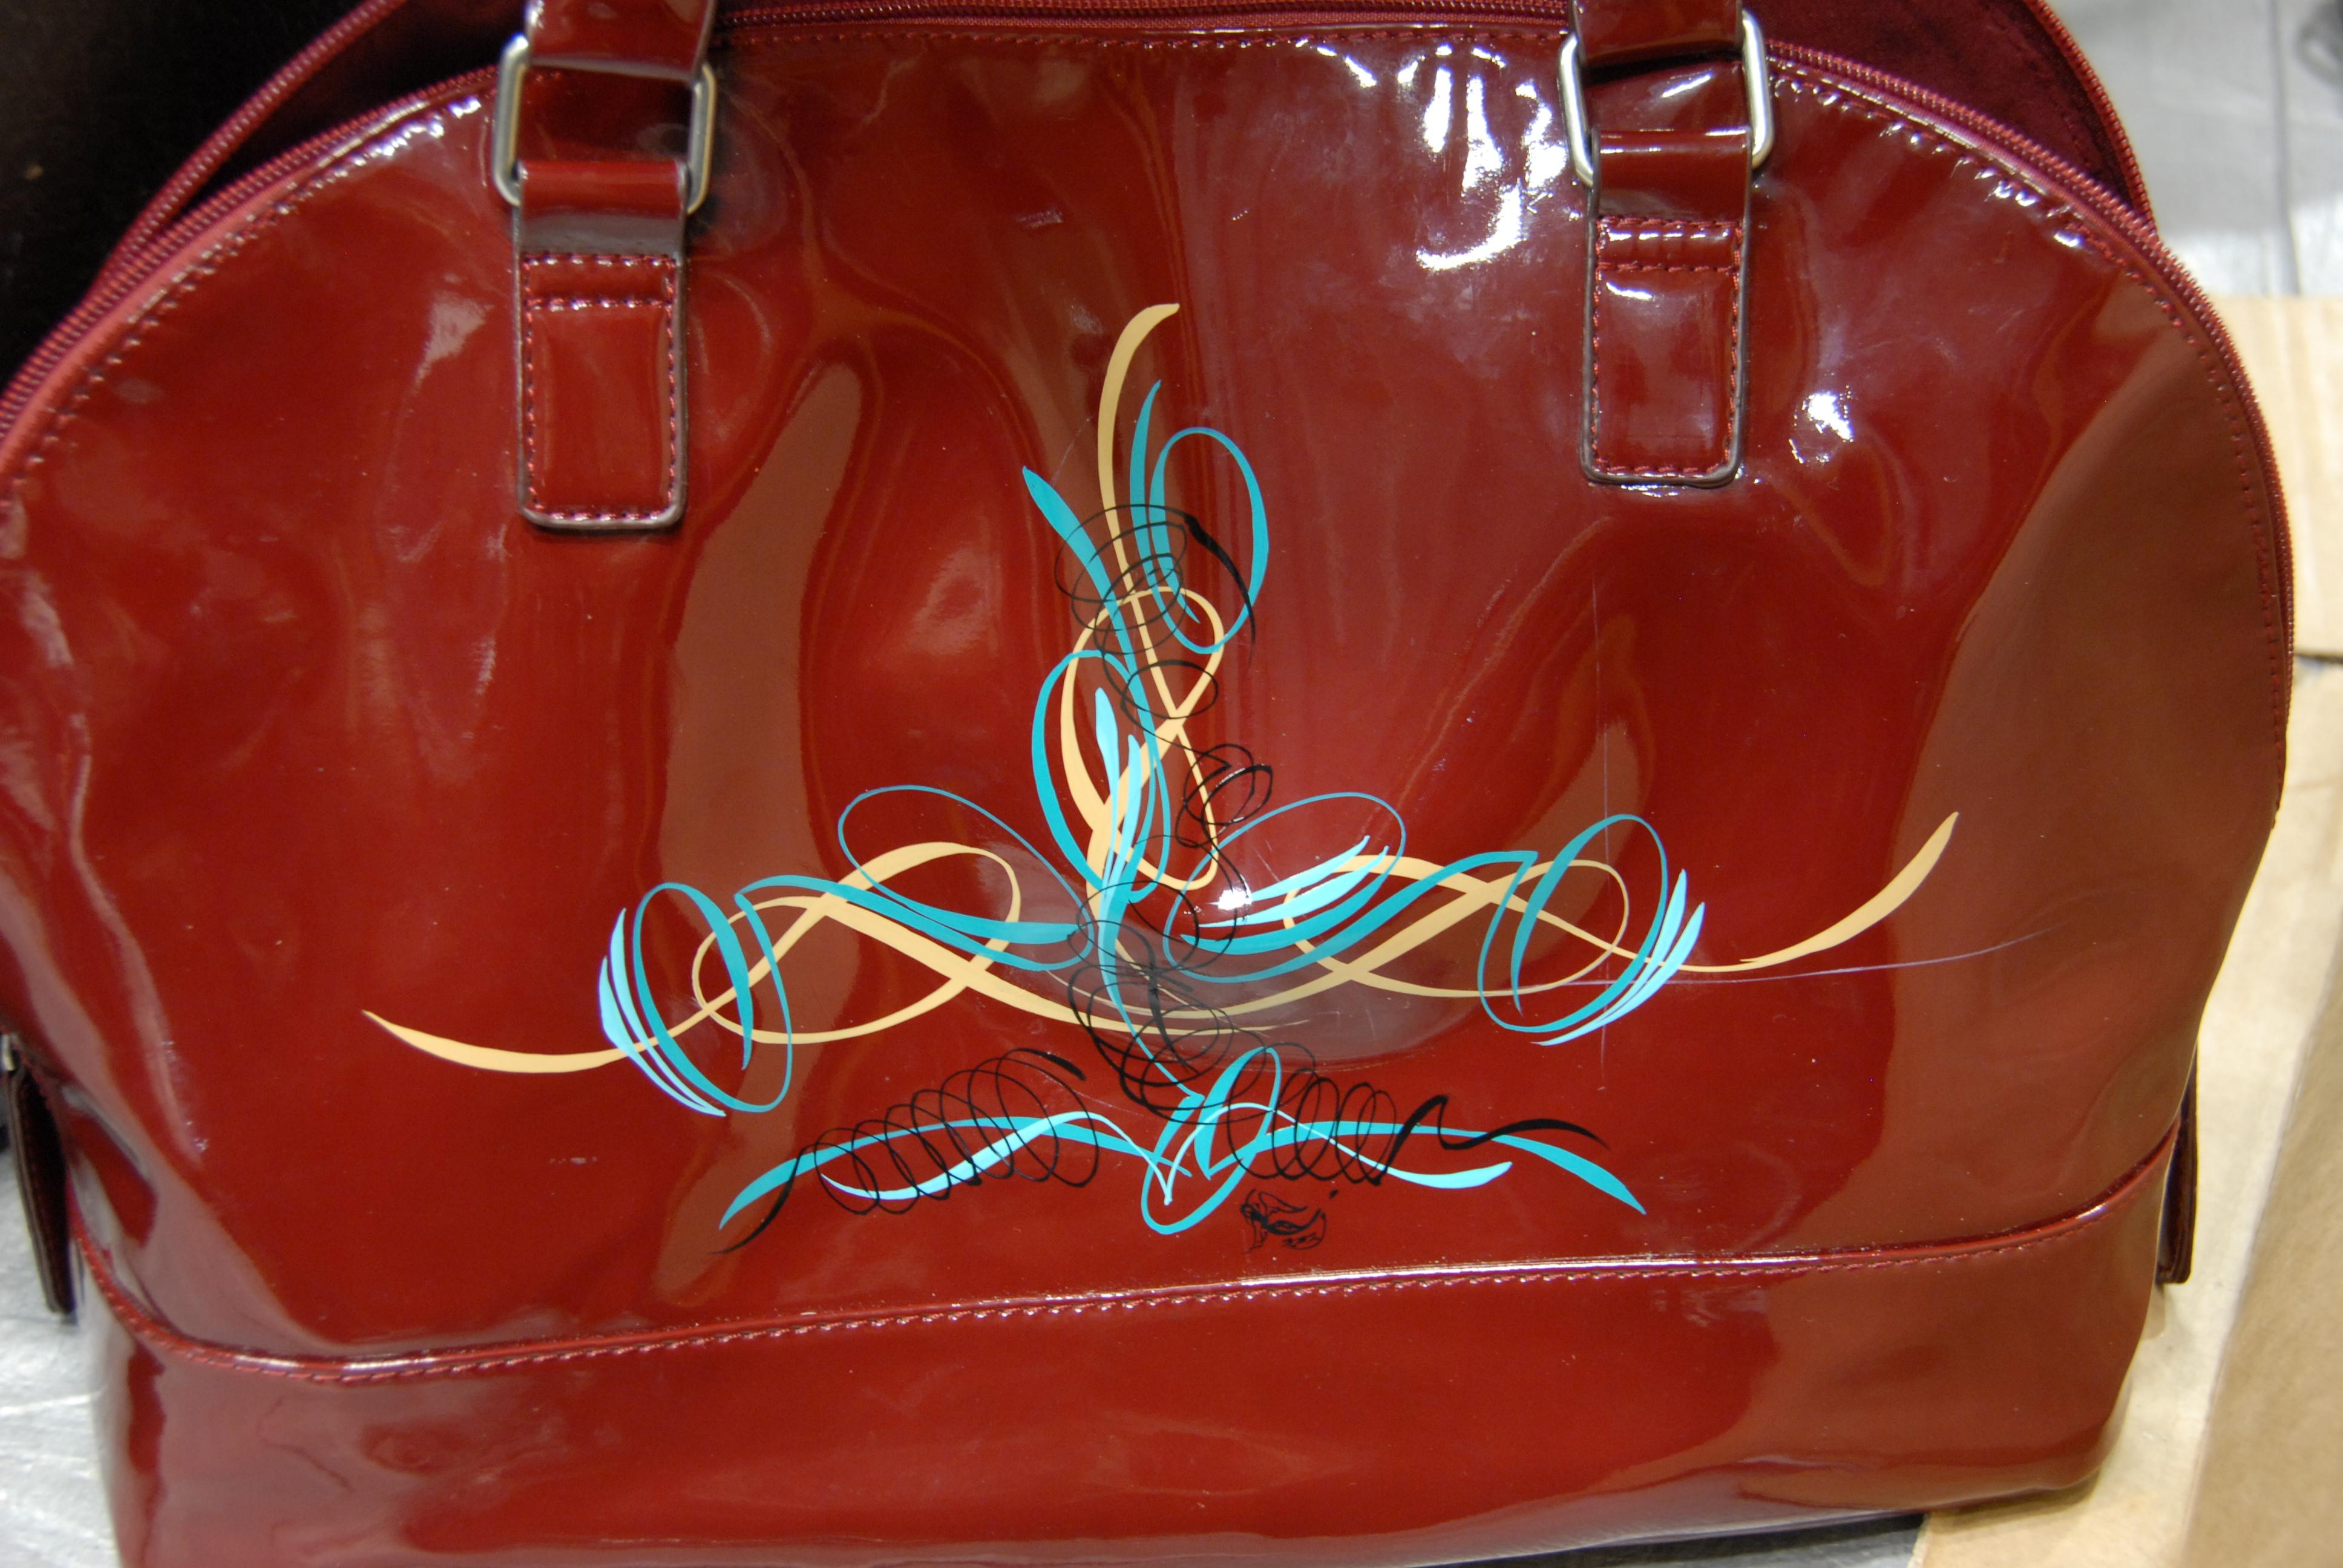 Wizzzcraft custom bag